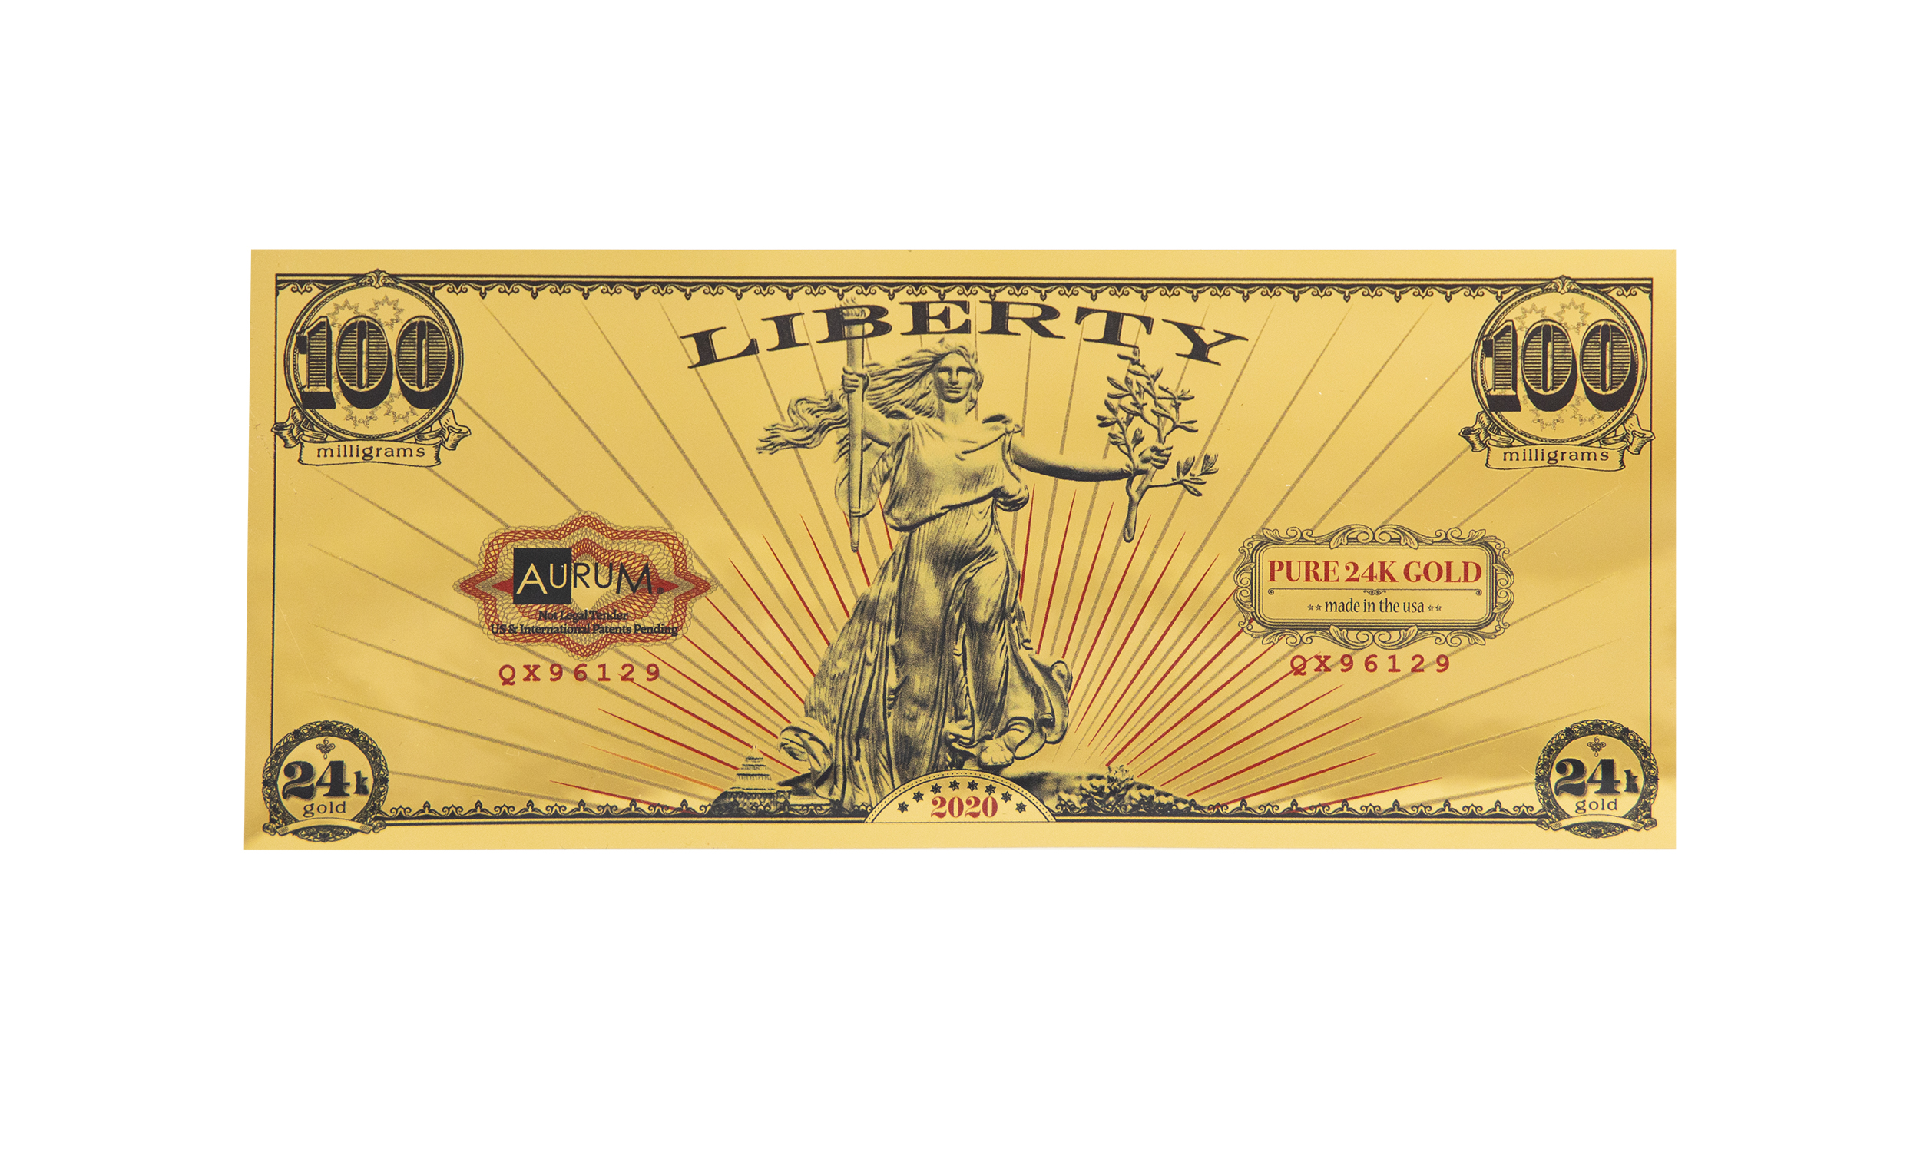 2020 St. Gauden's Liberty Aurum®